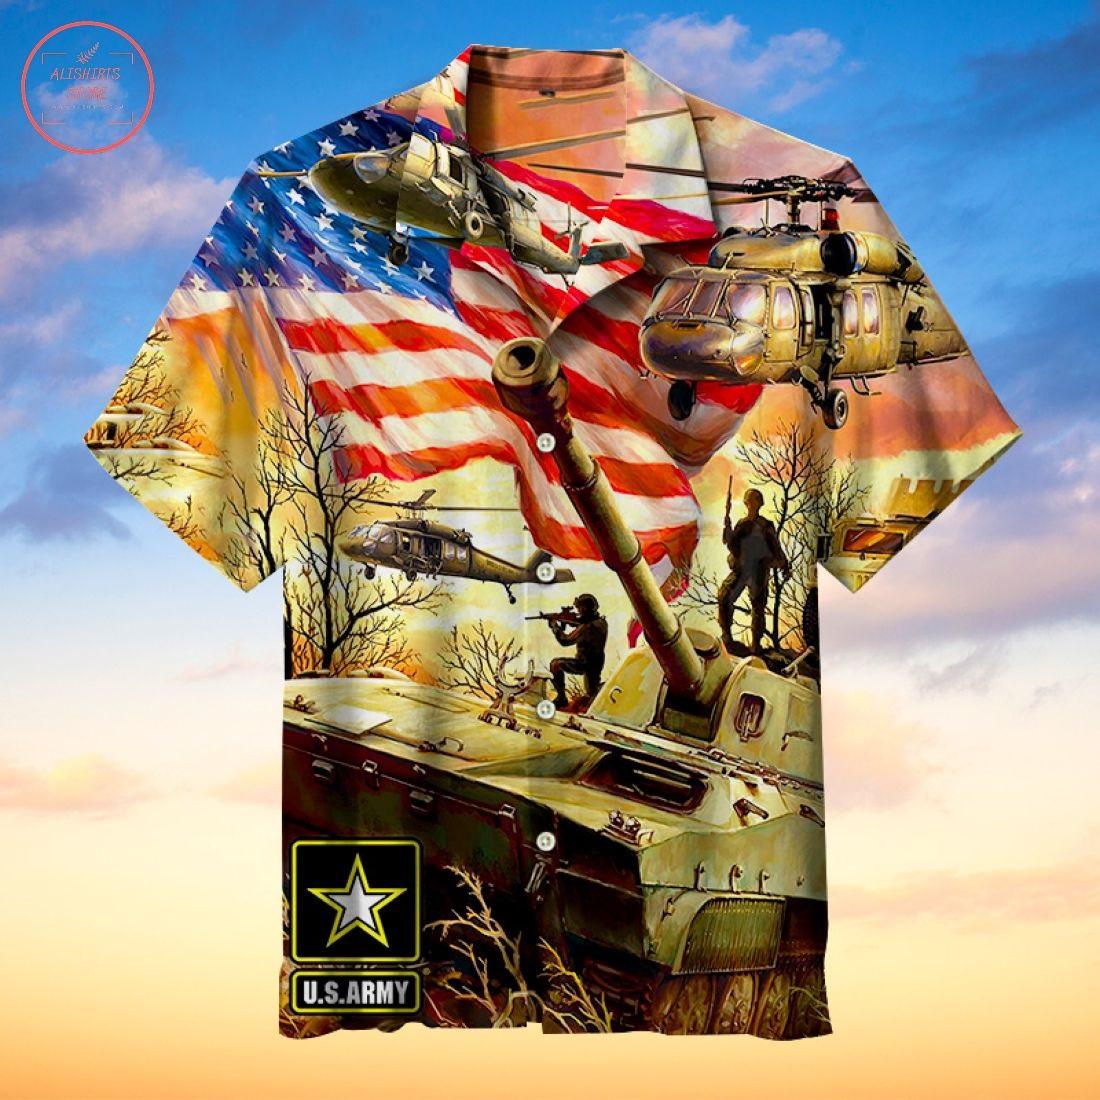 Tank army Hawaiian shirt